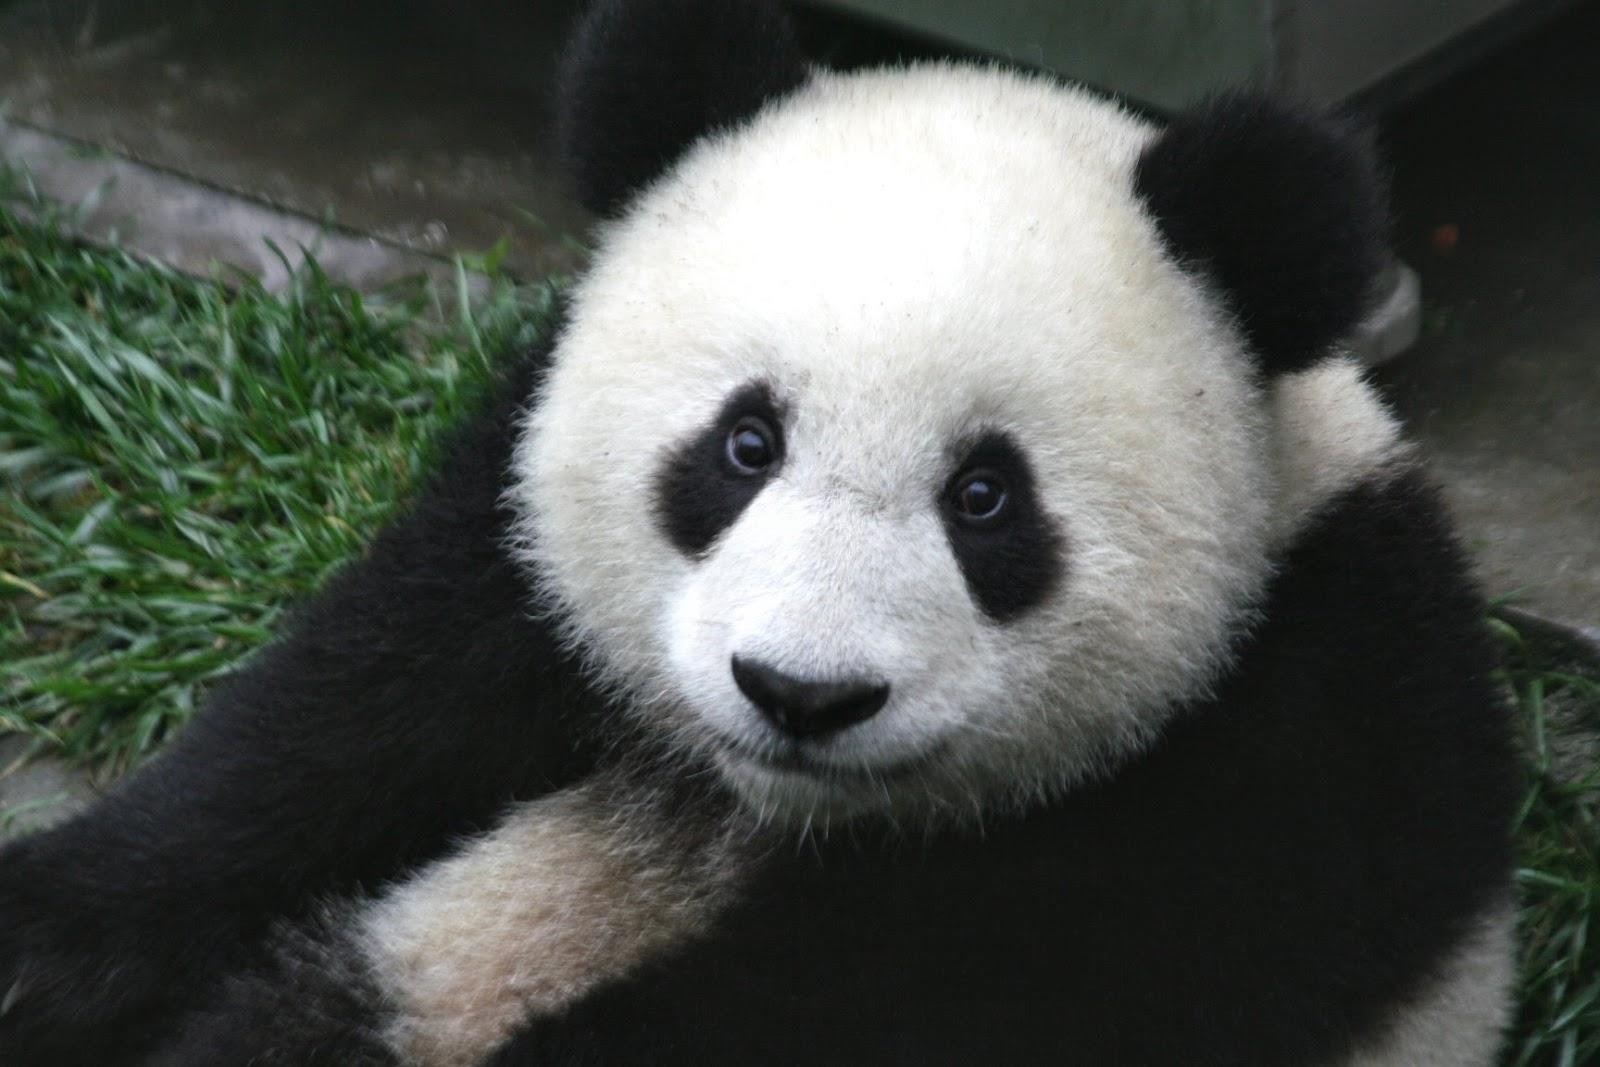 http://4.bp.blogspot.com/-LwtID9uHJfc/Tp1p8_lAqWI/AAAAAAAADfs/Lr_bwq3NwRE/s1600/Panda_HD_Wallpaper_Vvallpaper.Net.jpg